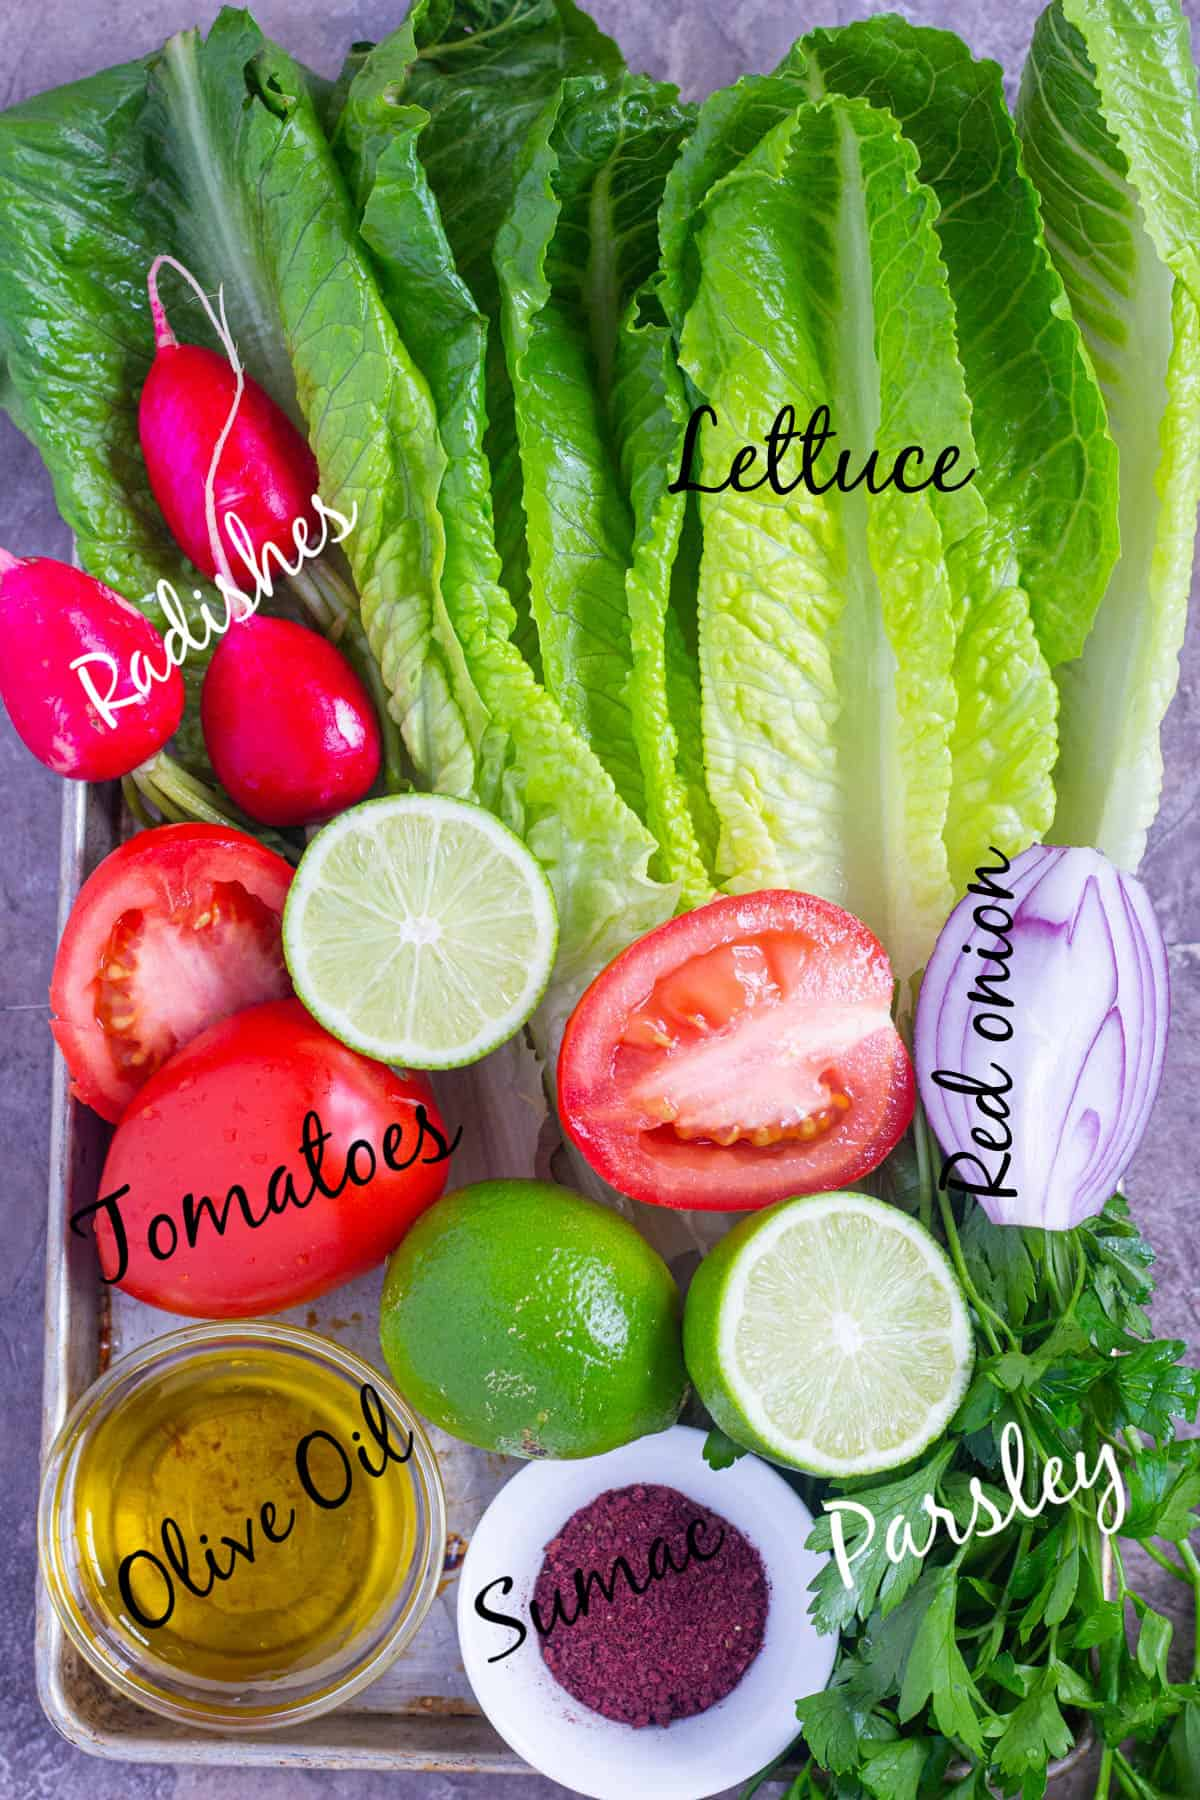 Lebanese salad ingredients are lettuce, radishes, tomatoes, lime, onion, sumac and parsley.